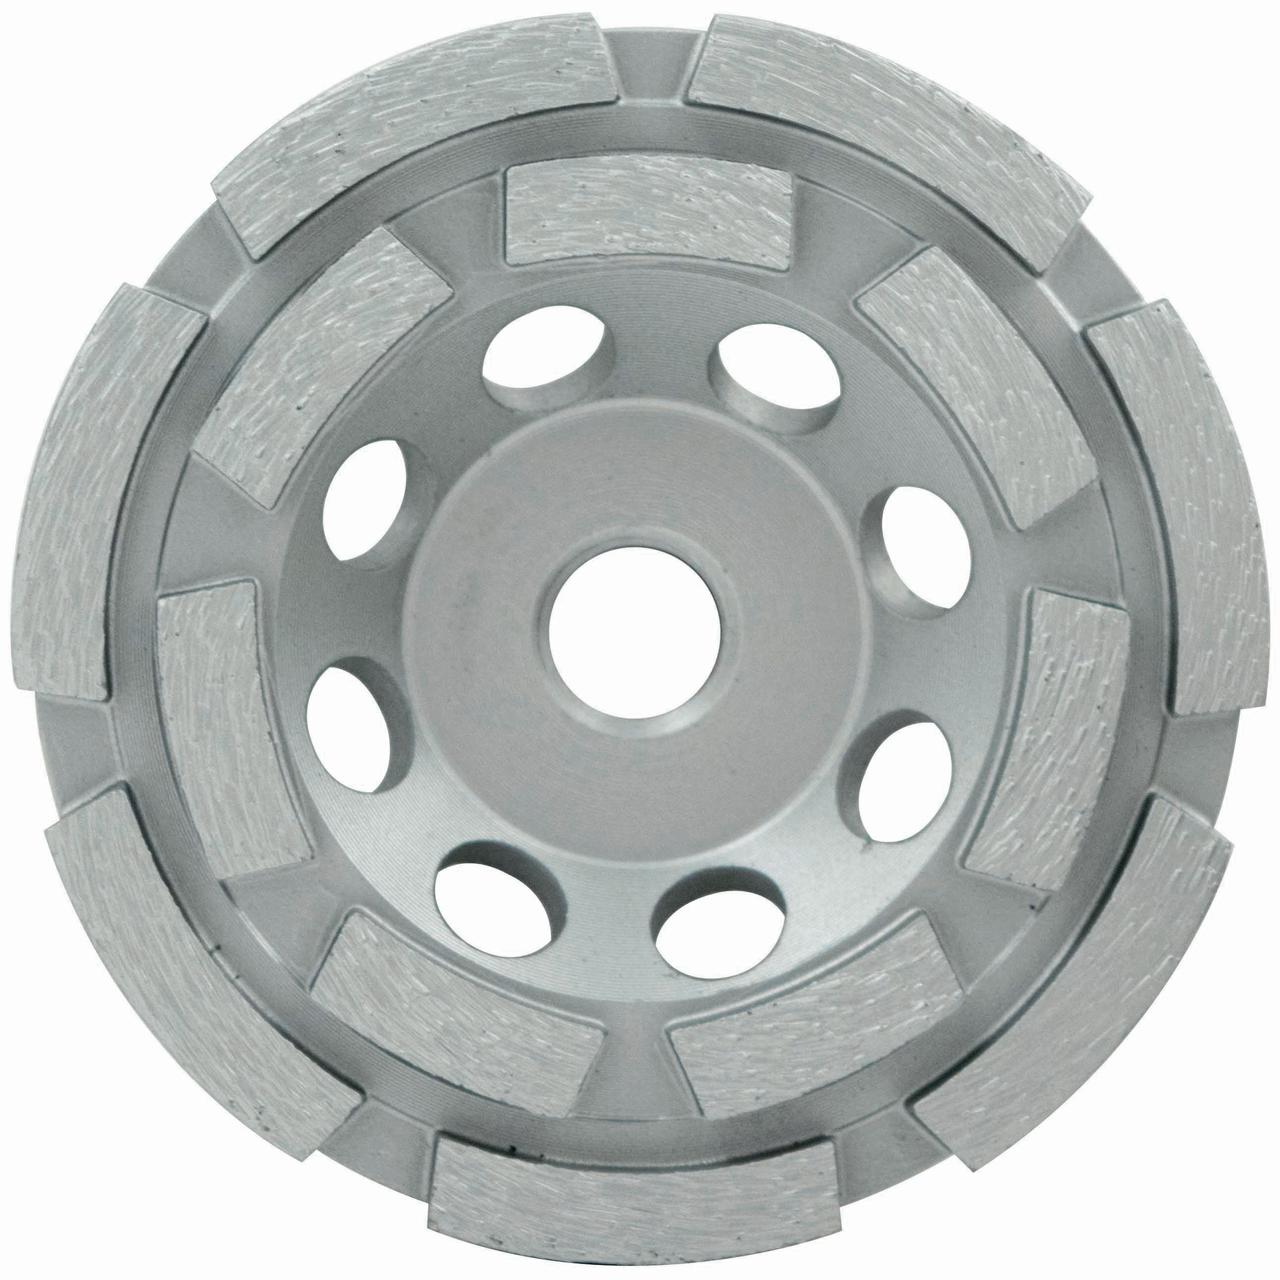 "5"" Spp Series Double Row Cup Wheel, Wet/Dry, 7/8""-5/8"""